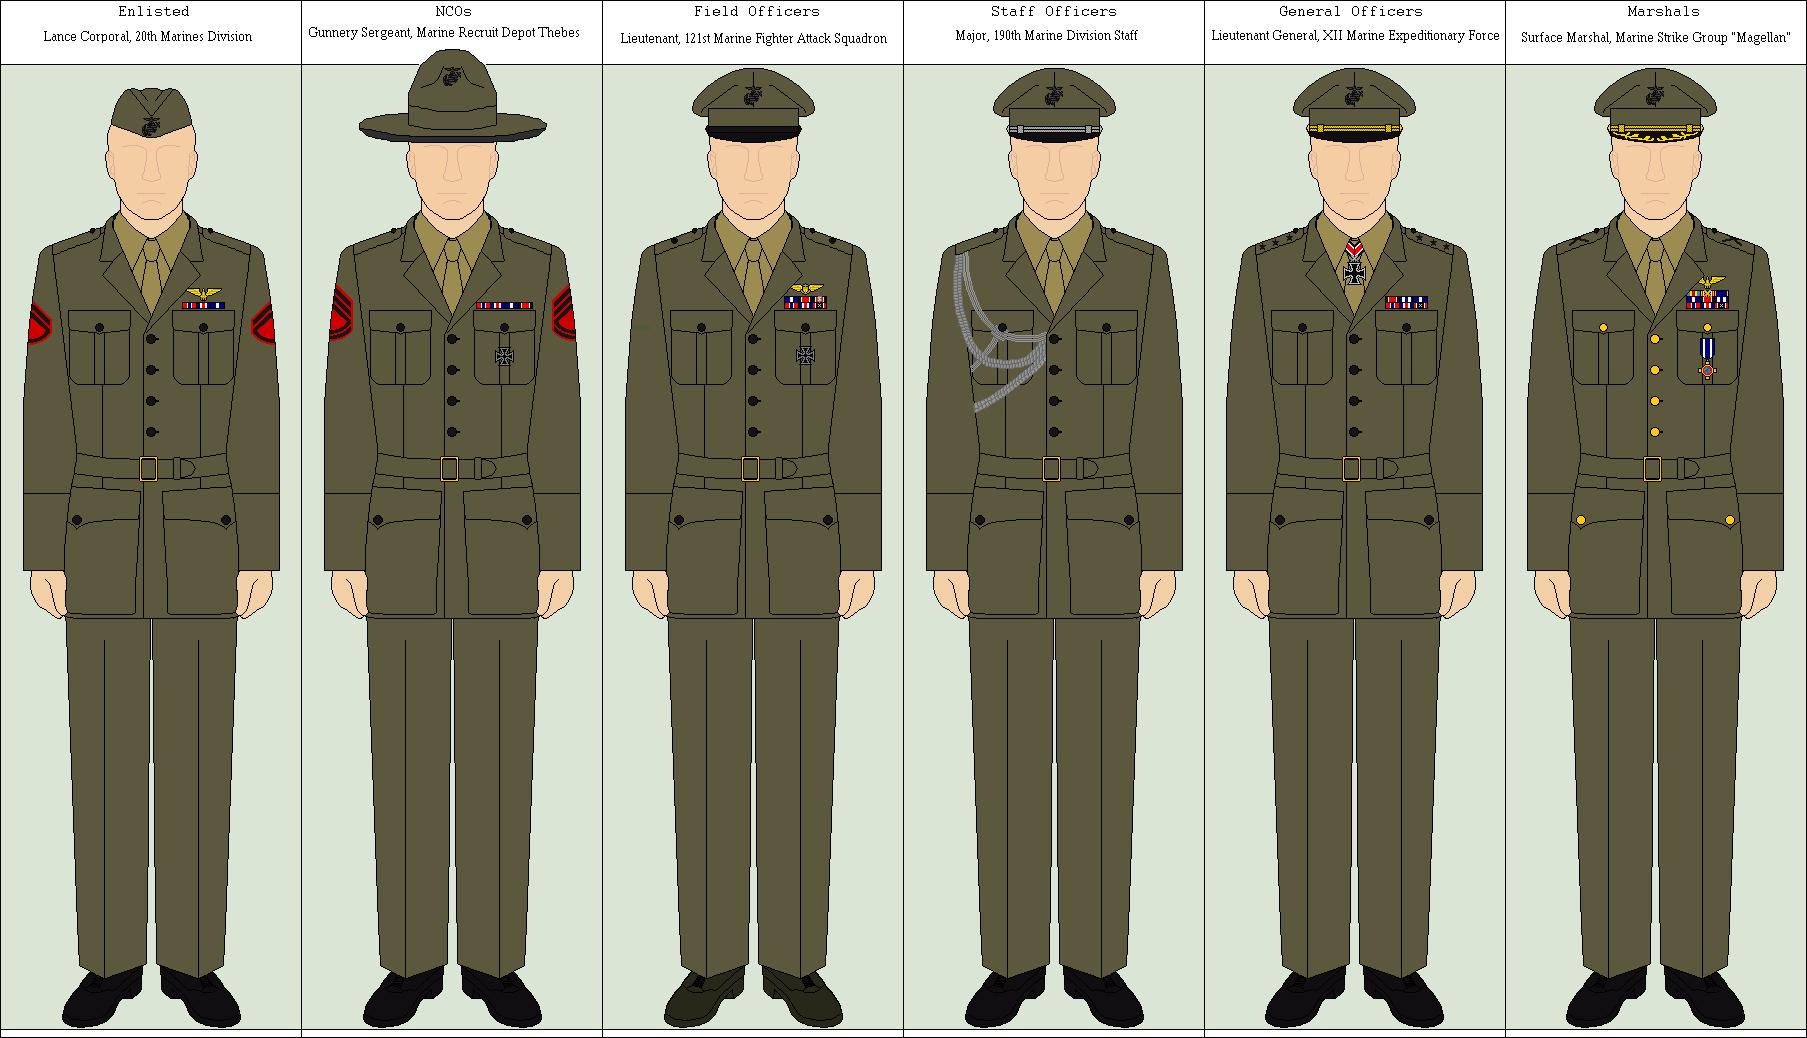 Marine Service Uniform by Louisvillian on DeviantArt